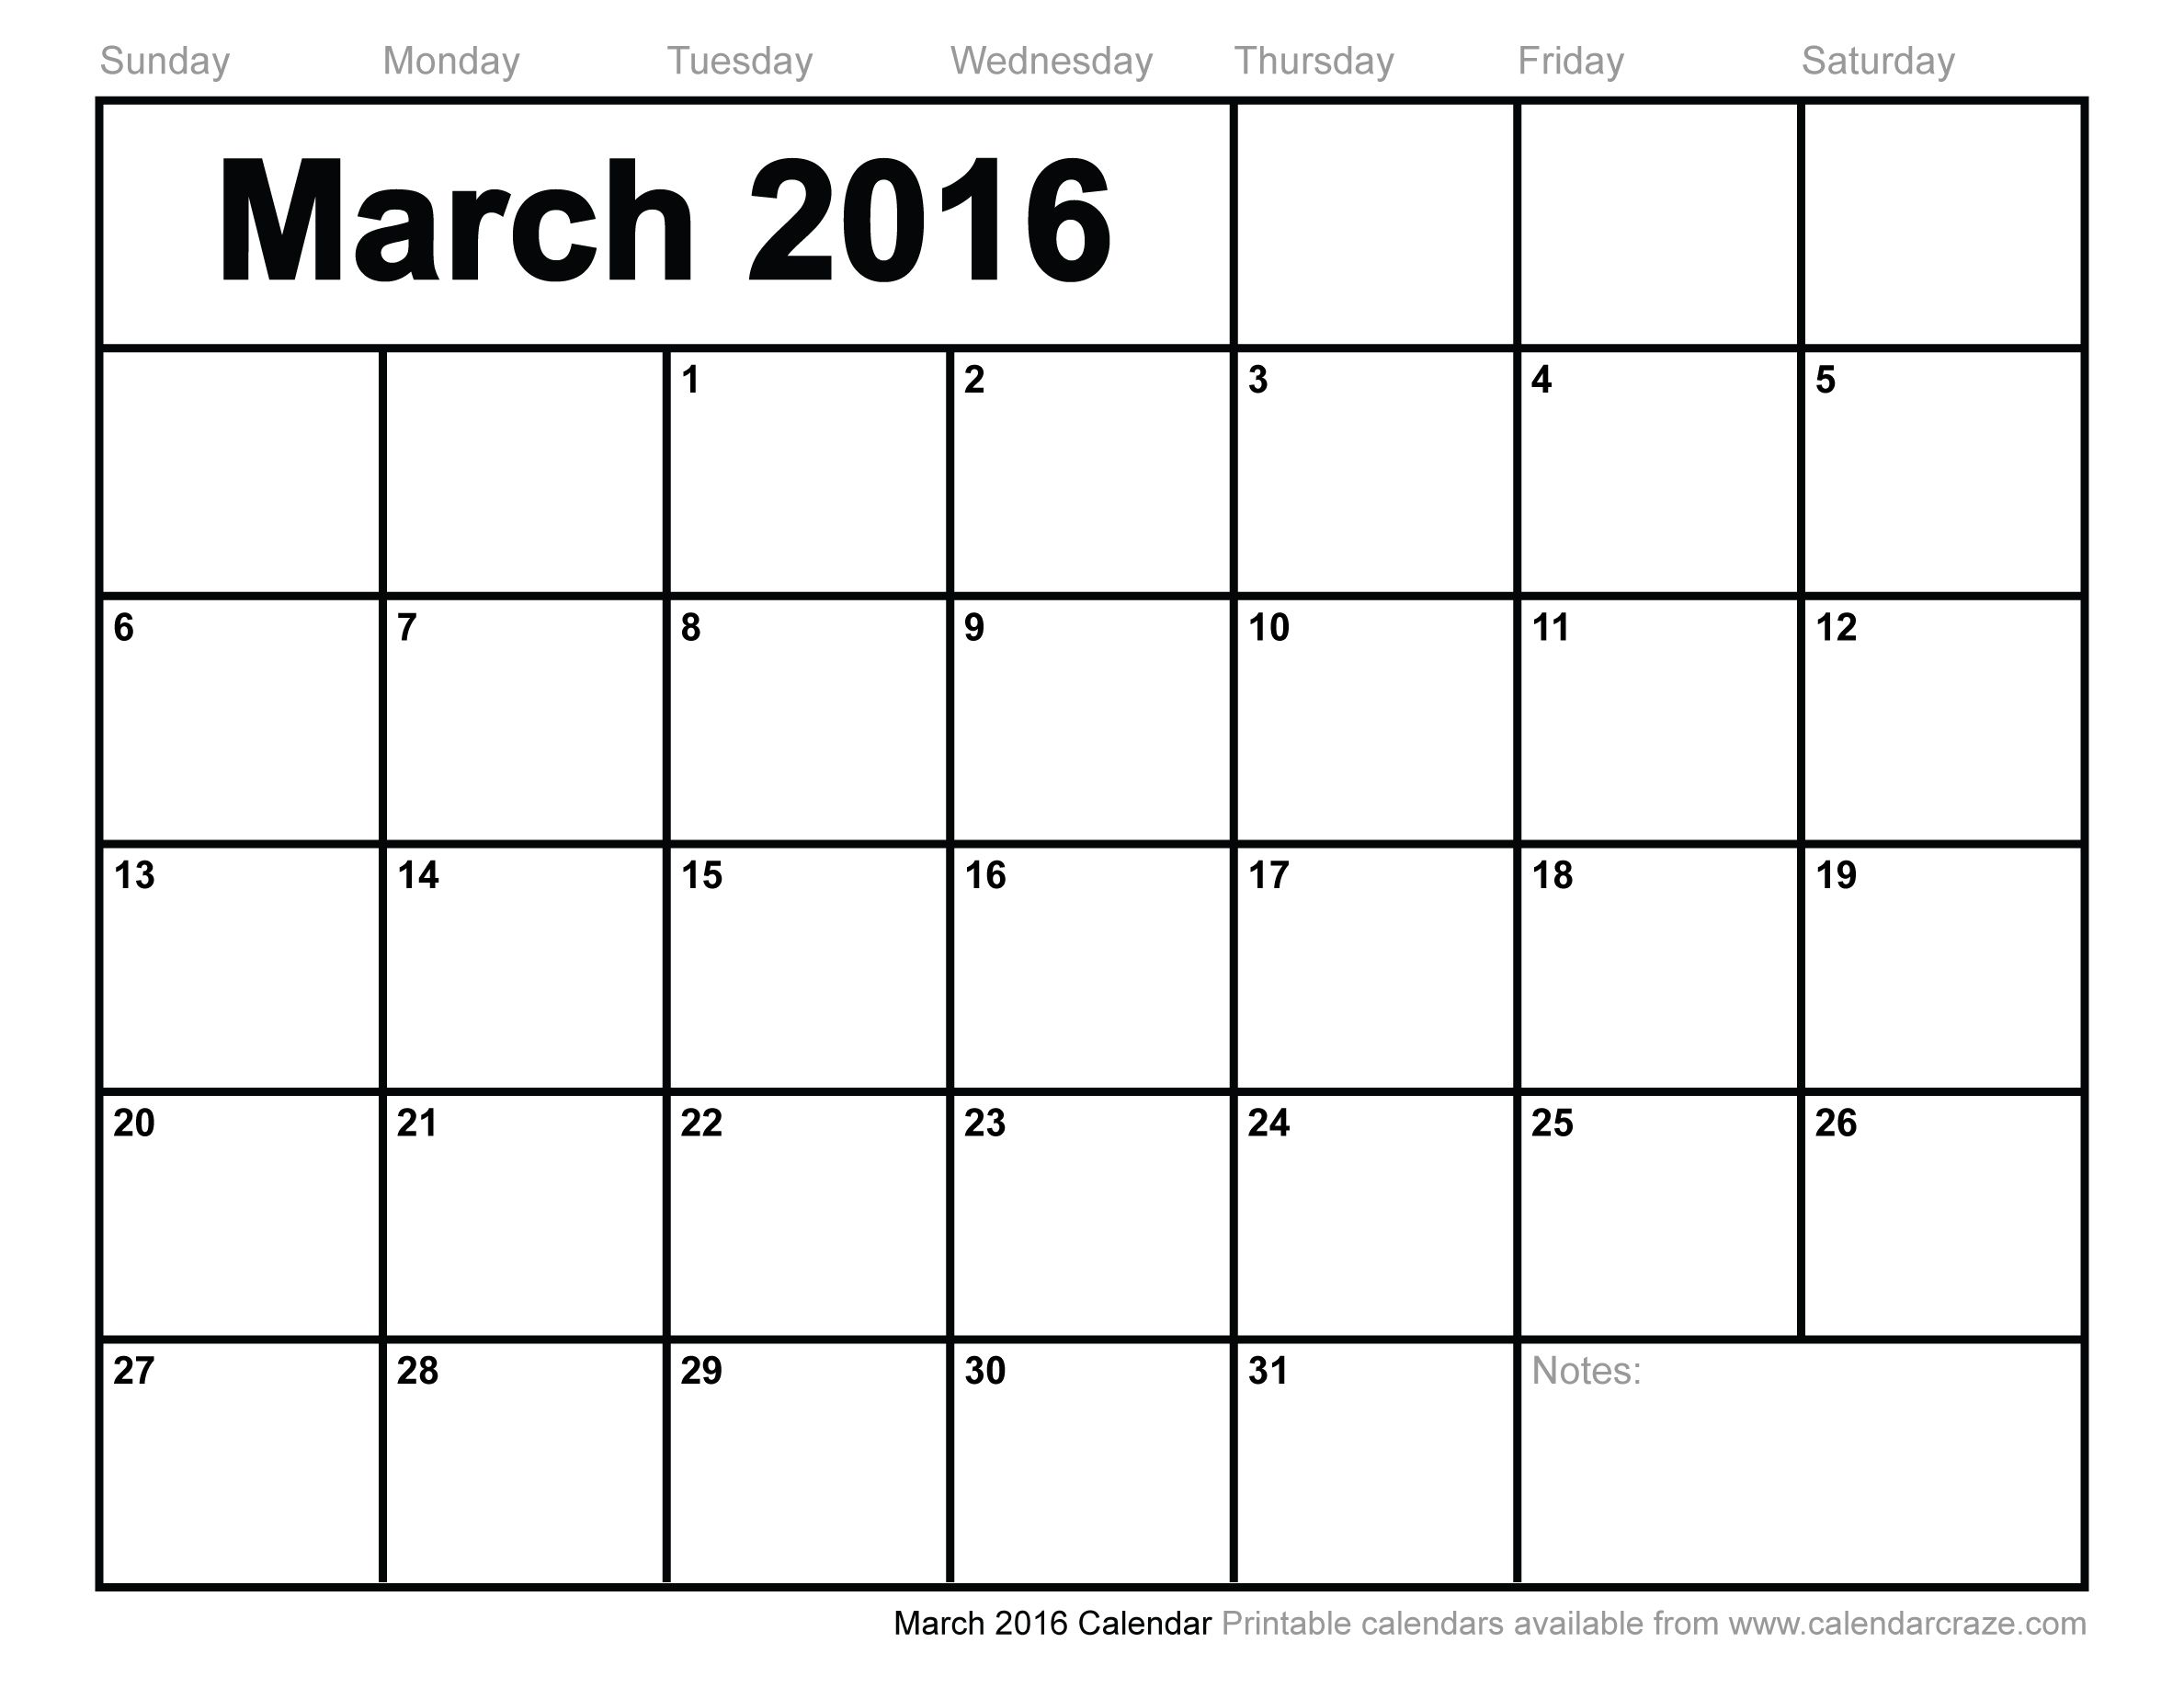 mar 2016 calendar printable pdf - Google Search | Recipes to Cook ...